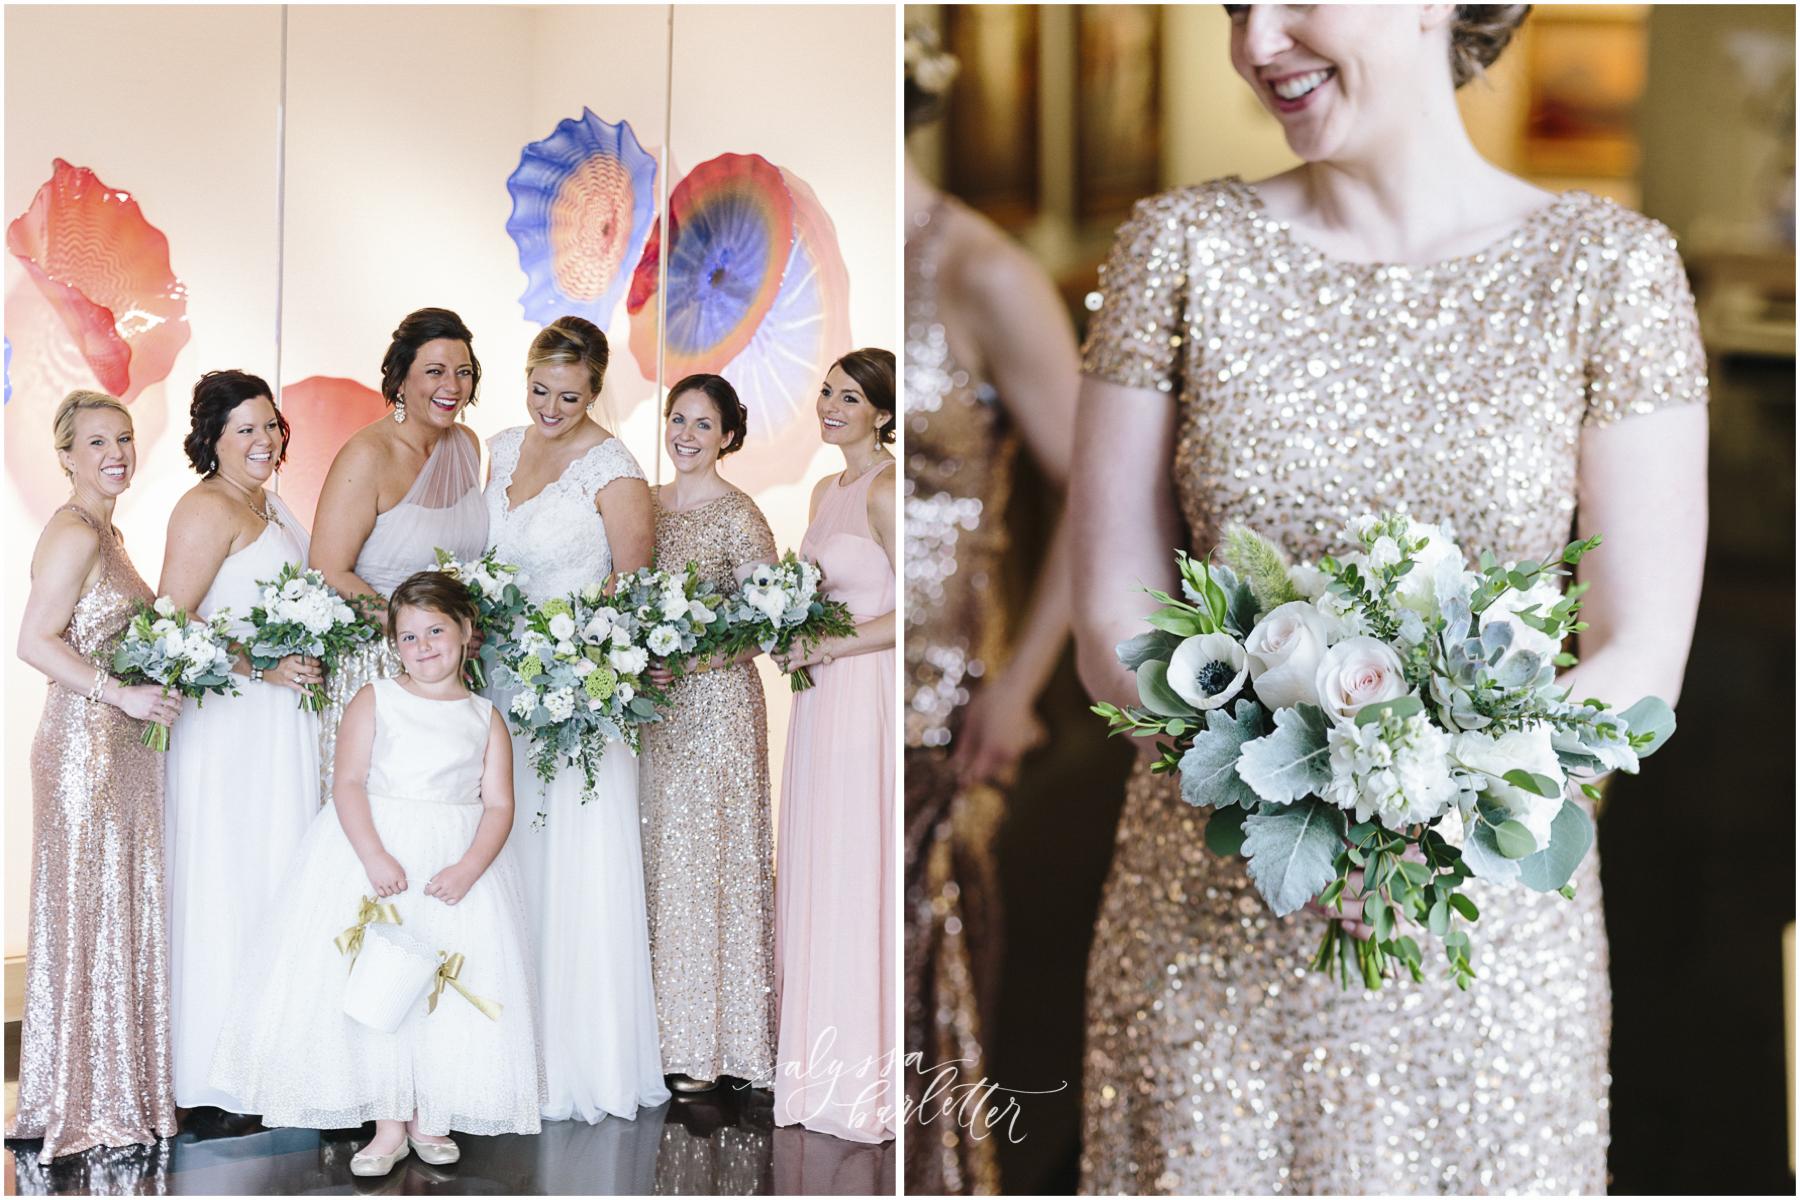 alyssa barletter photography cider gallery lawrence kansas rainy day wedding megan and brett-1-21.jpg